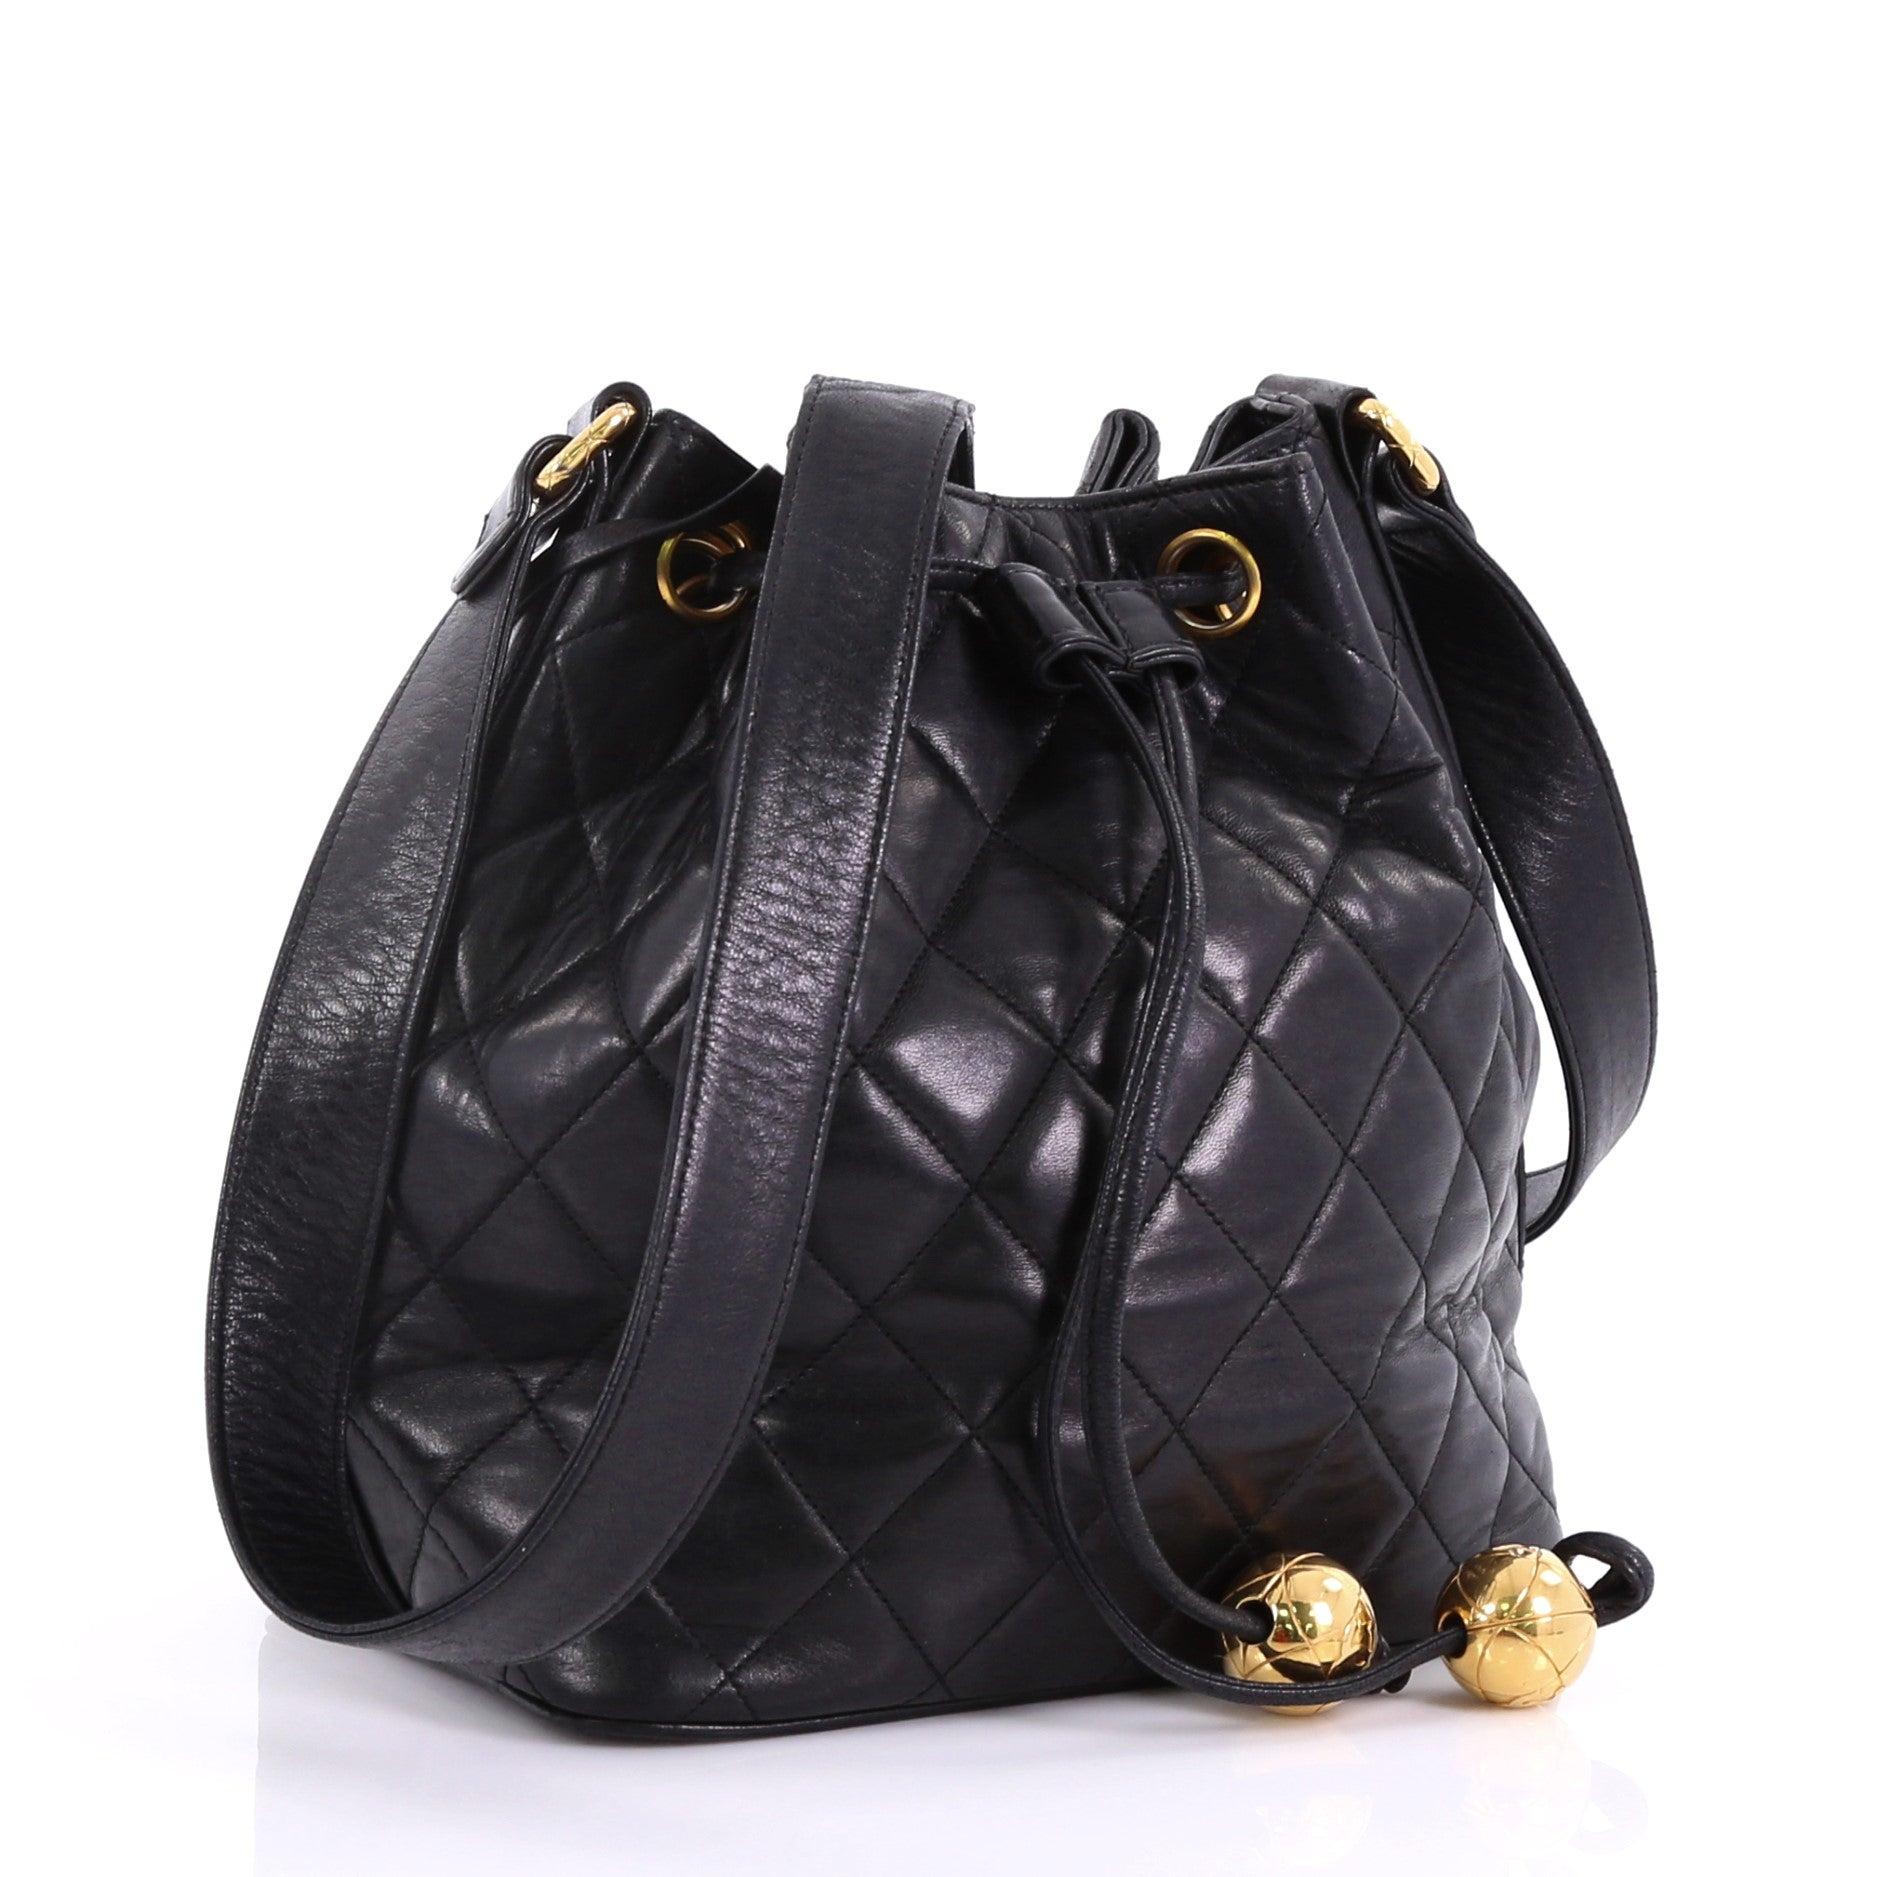 1da0391400ef86 Chanel Vintage Drawstring Bucket Bag Quilted Lambskin Small at 1stdibs